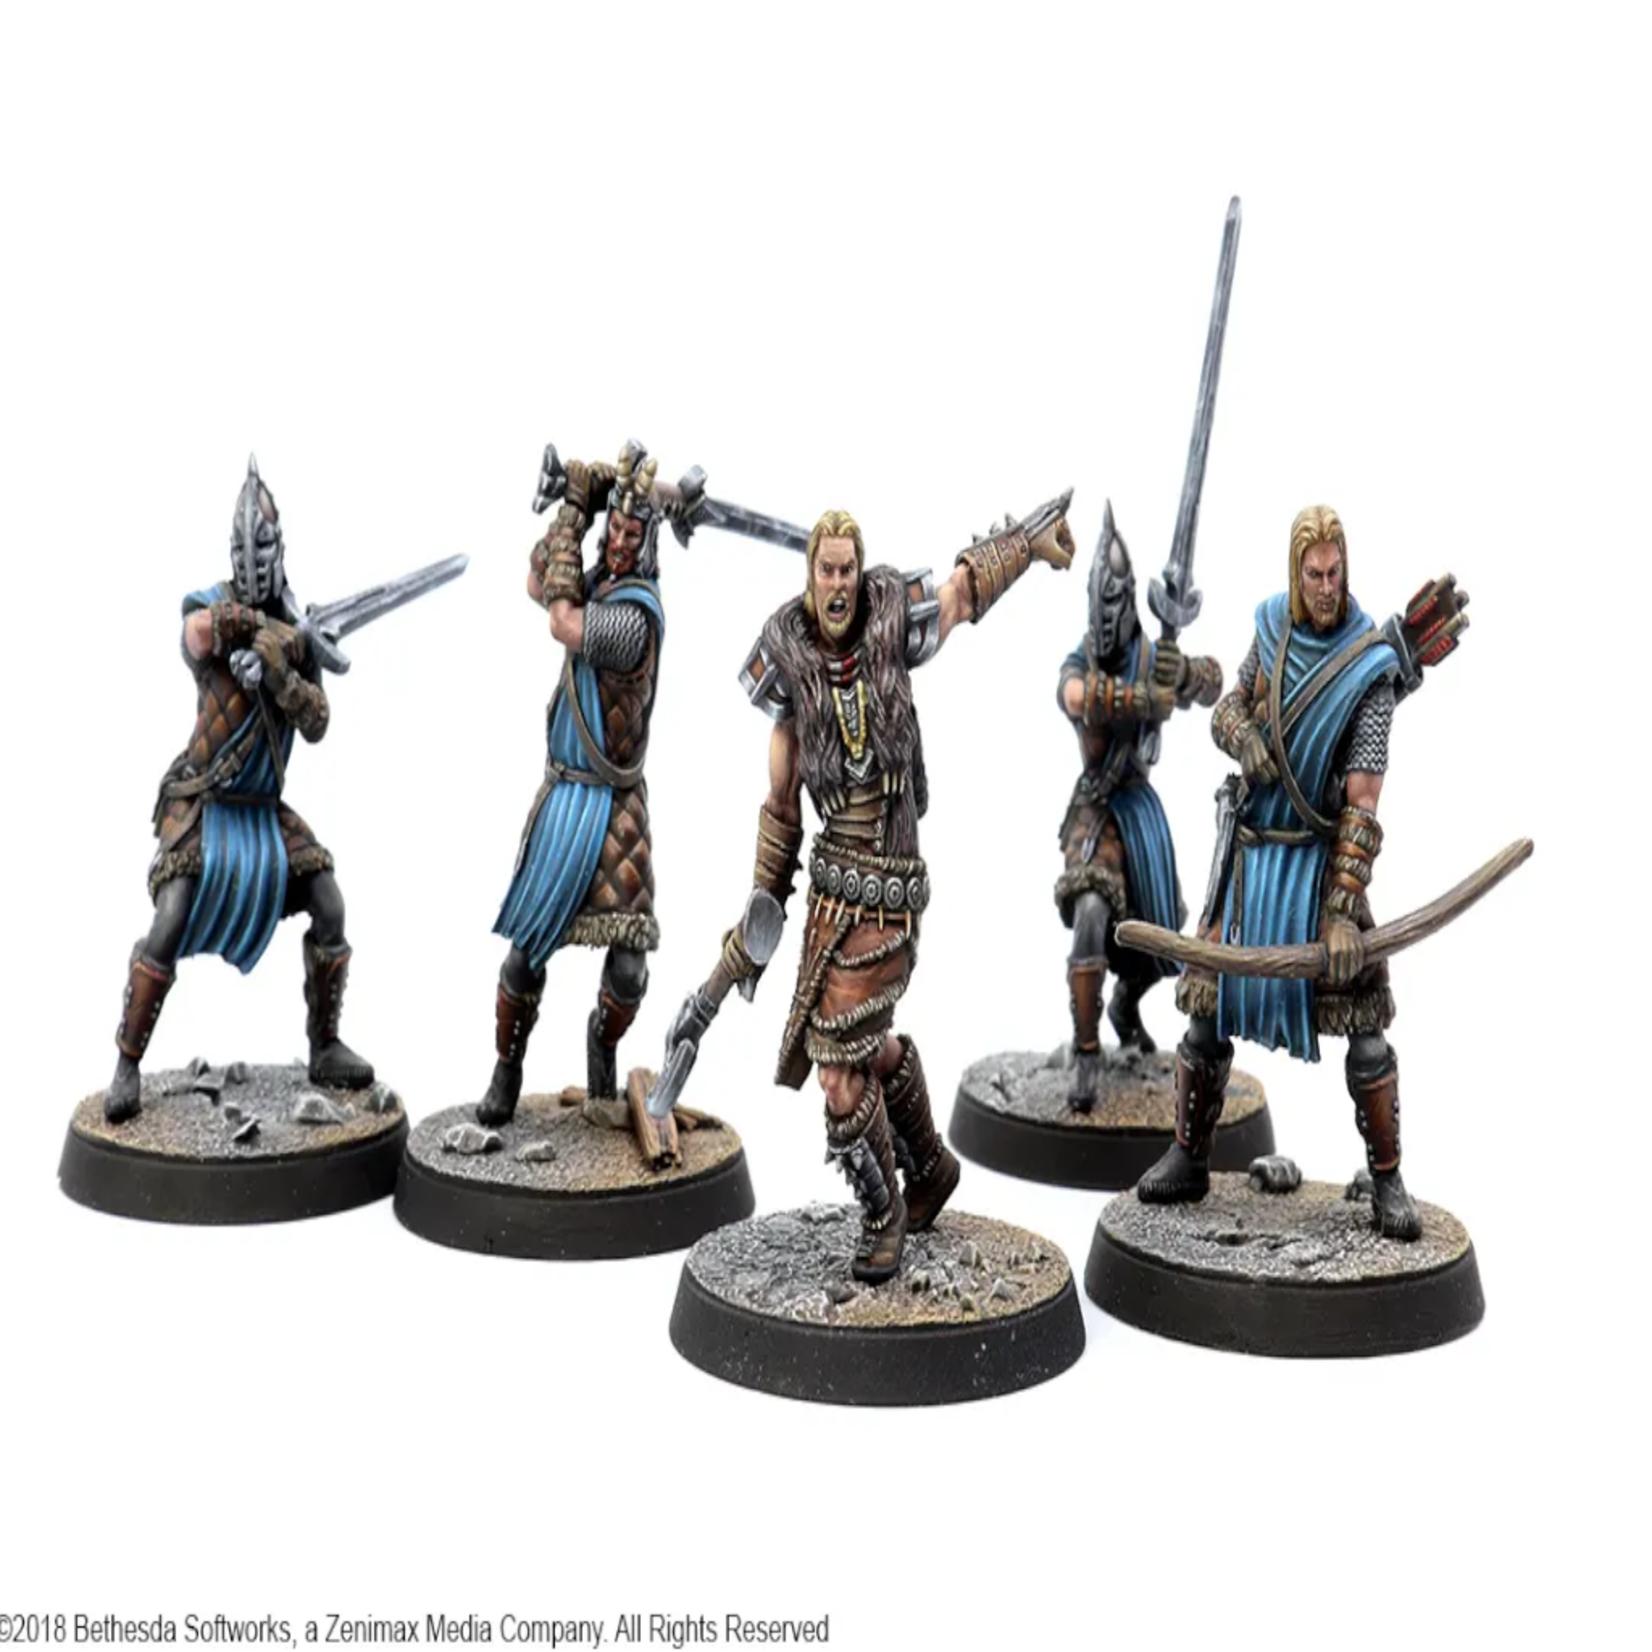 Elder Scrolls Call To Arms: Stormcloak Plastic Faction Starter